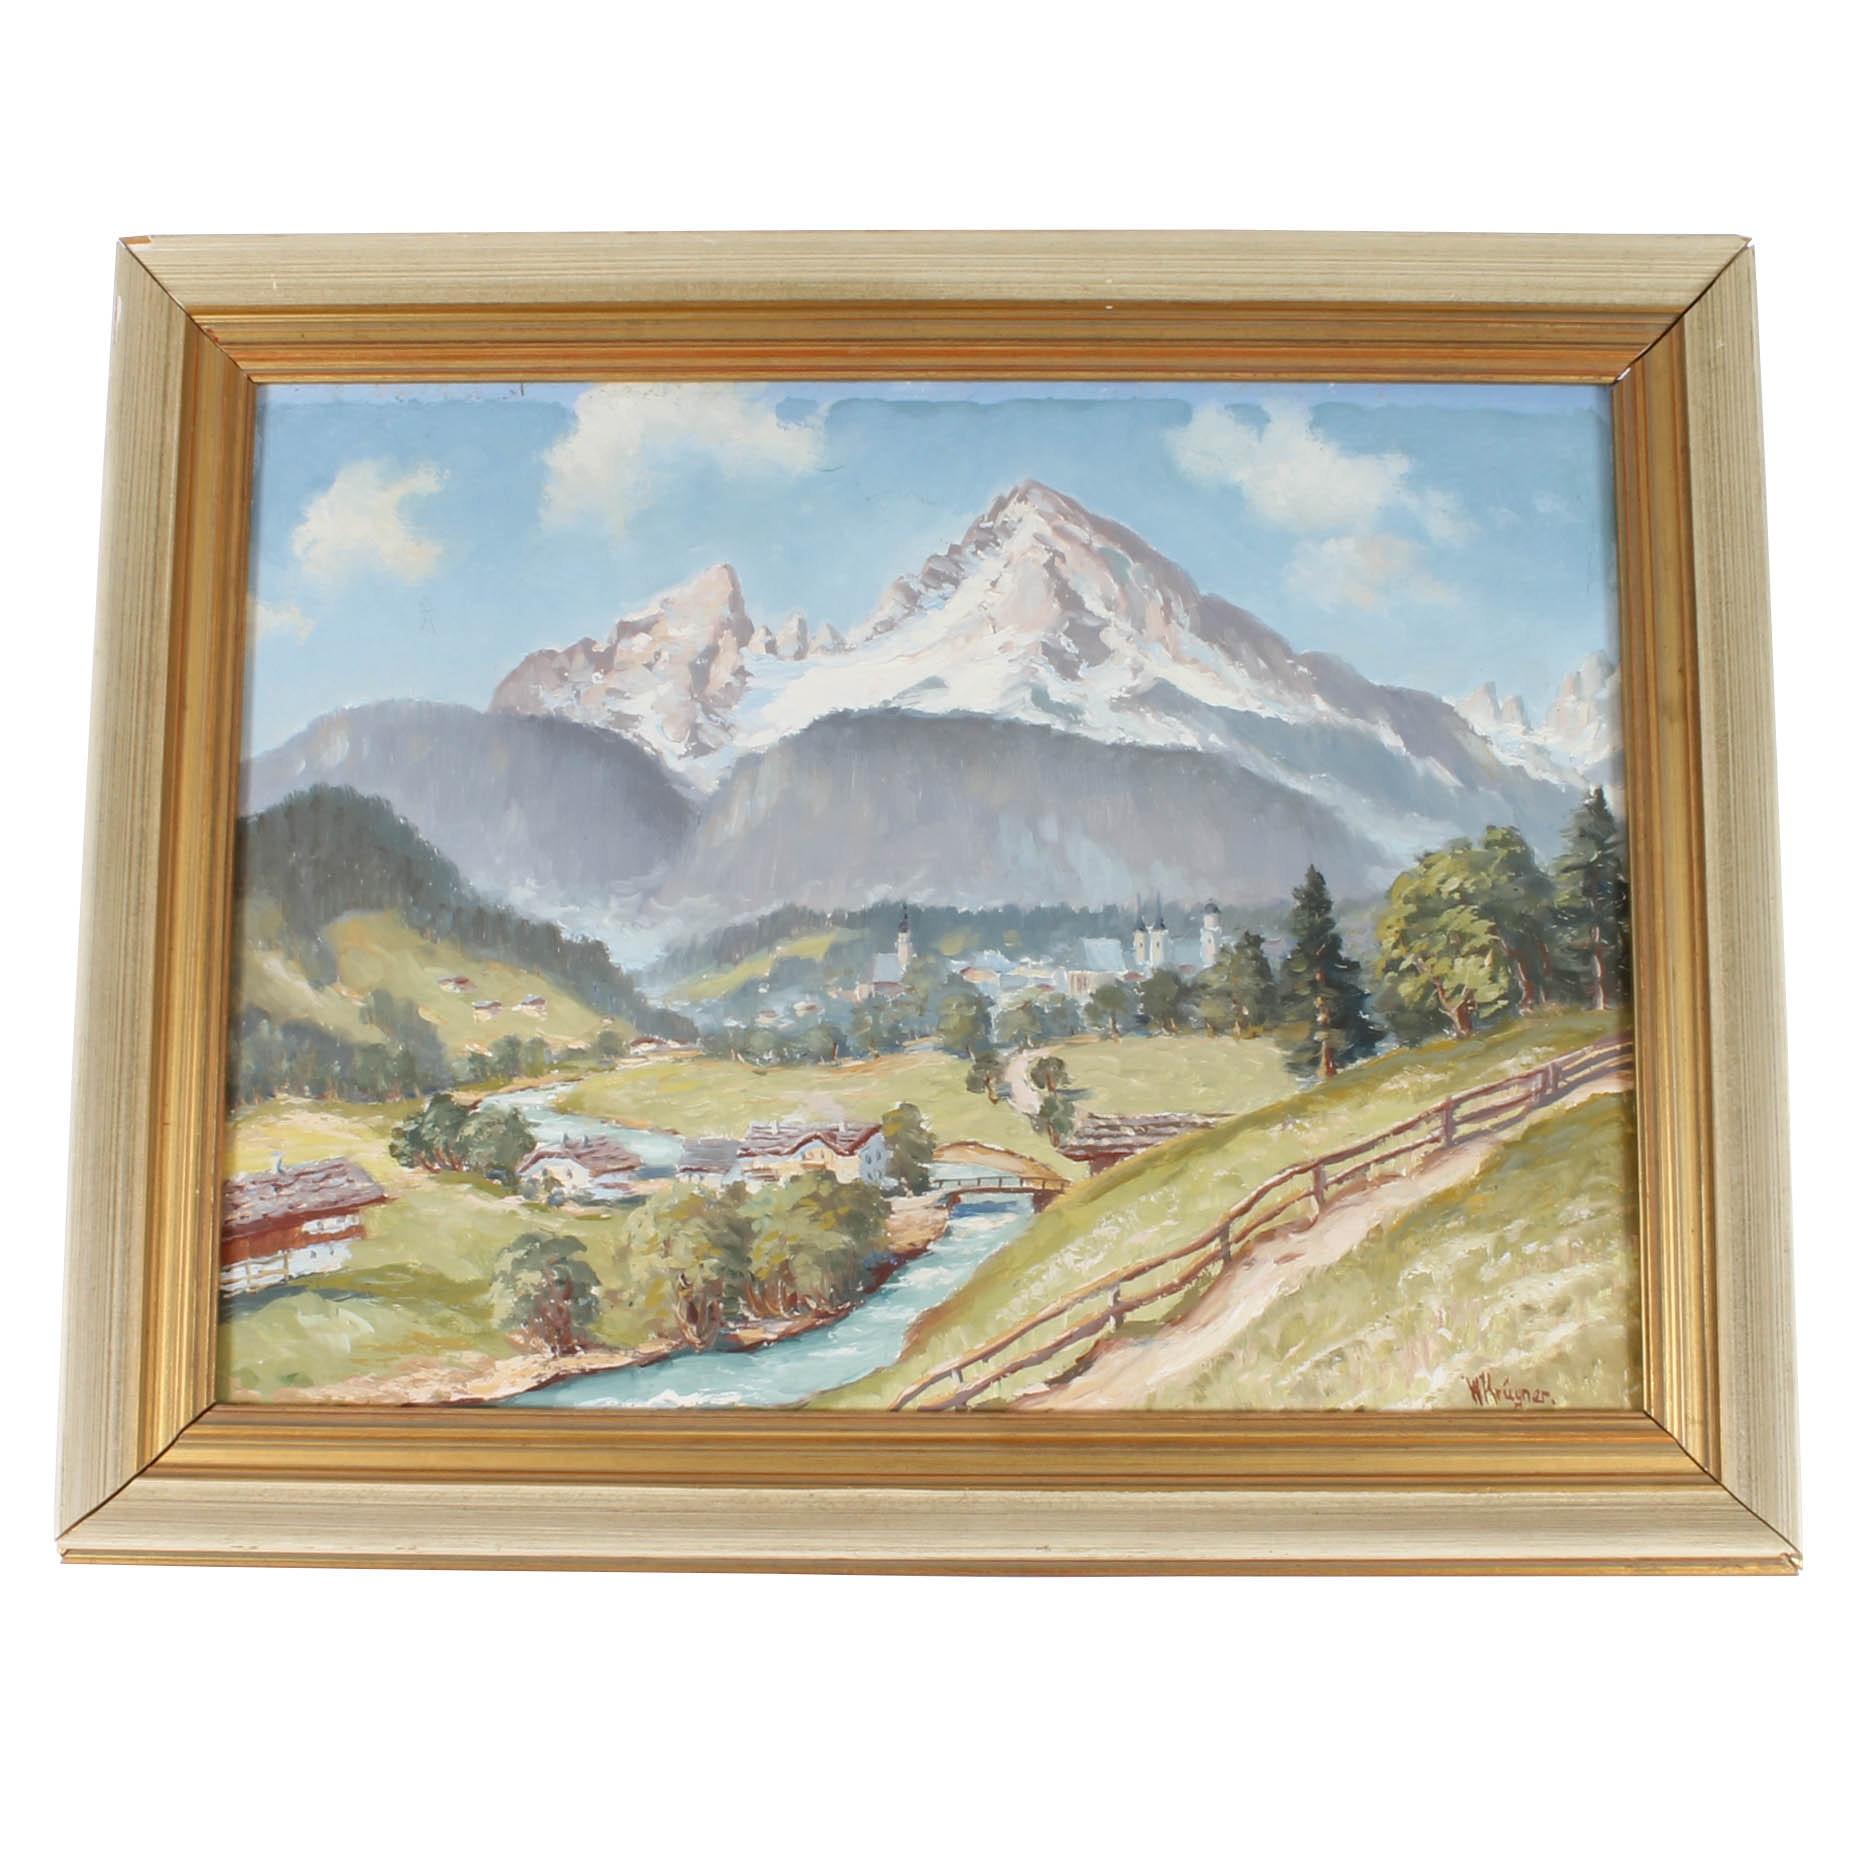 Original R. Krugner Mountain Landscape Painting